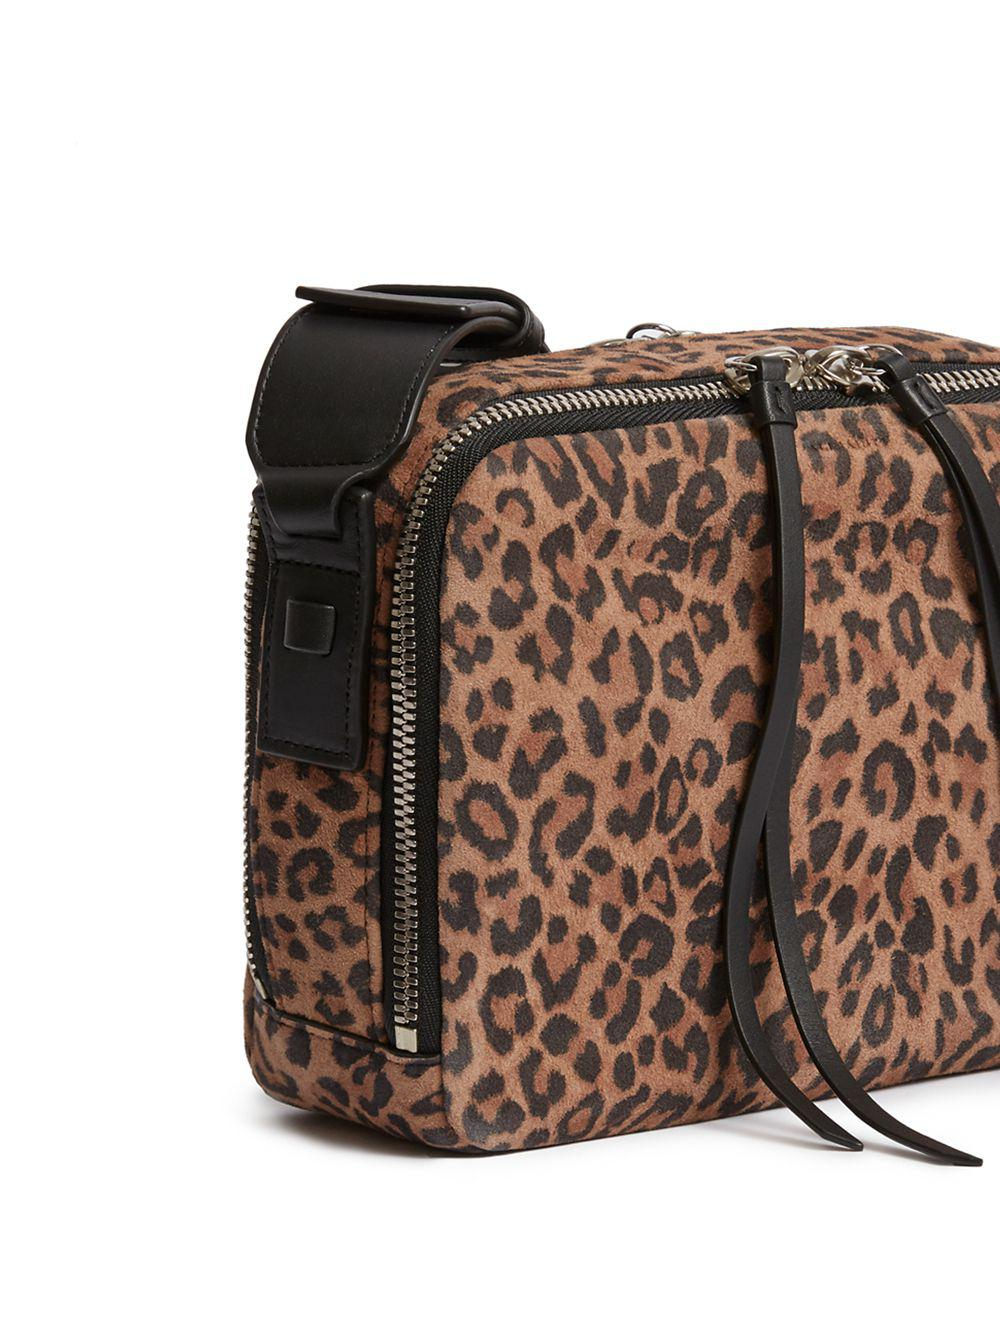 f0af62dbb AllSaints - Black Vincent Leopard Calf Hair And Leather Crossbody Bag -  Lyst. View fullscreen